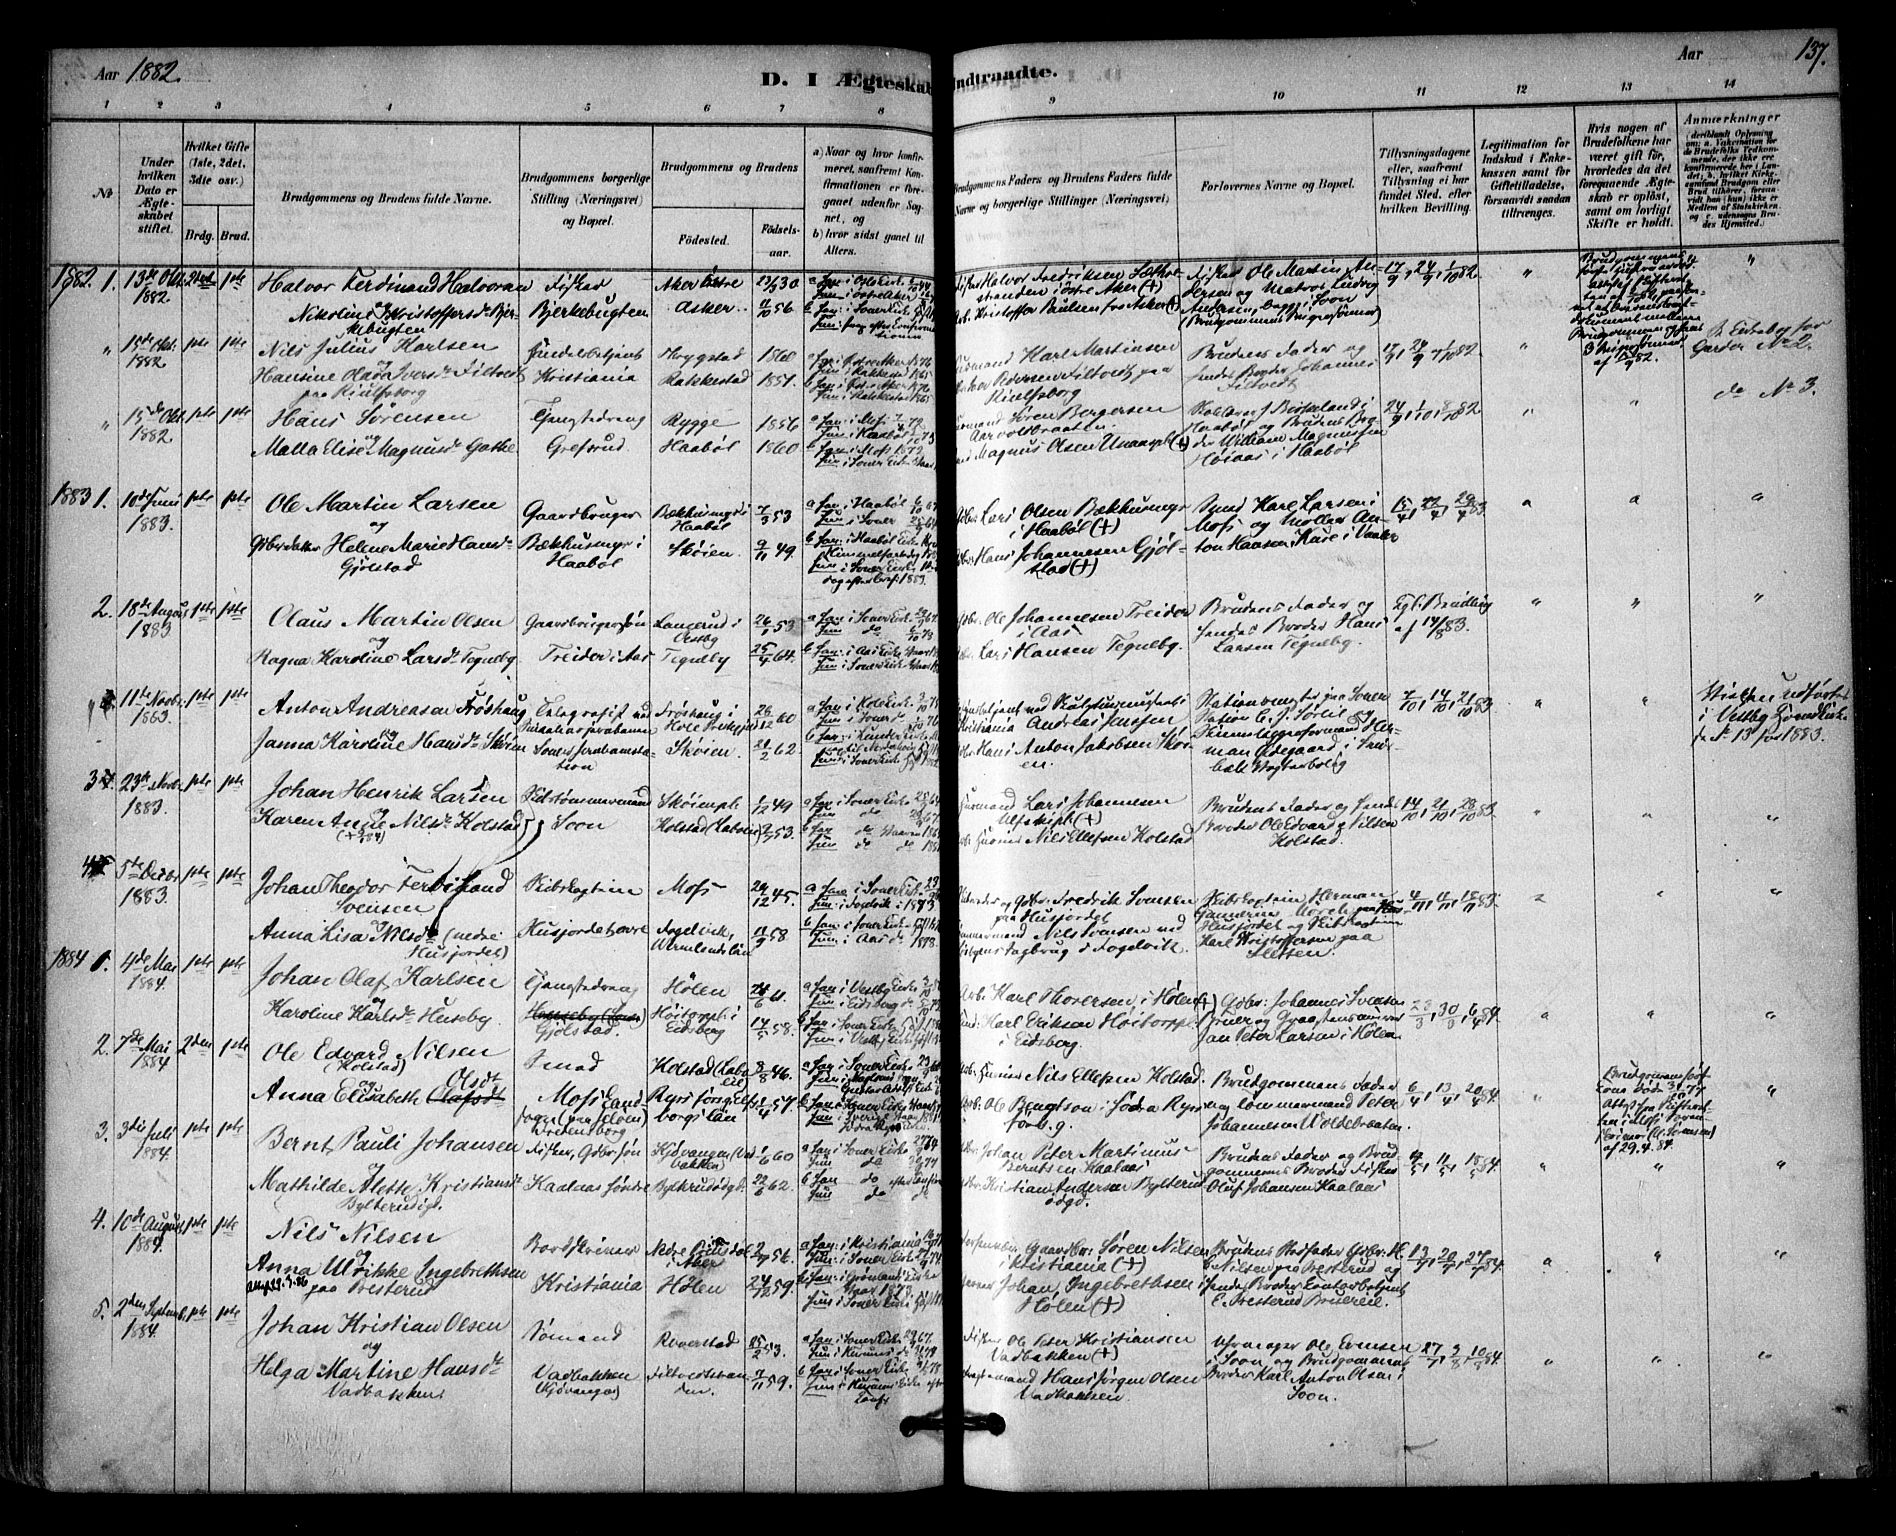 SAO, Vestby prestekontor Kirkebøker, F/Fb/L0001: Ministerialbok nr. II 1, 1878-1903, s. 137